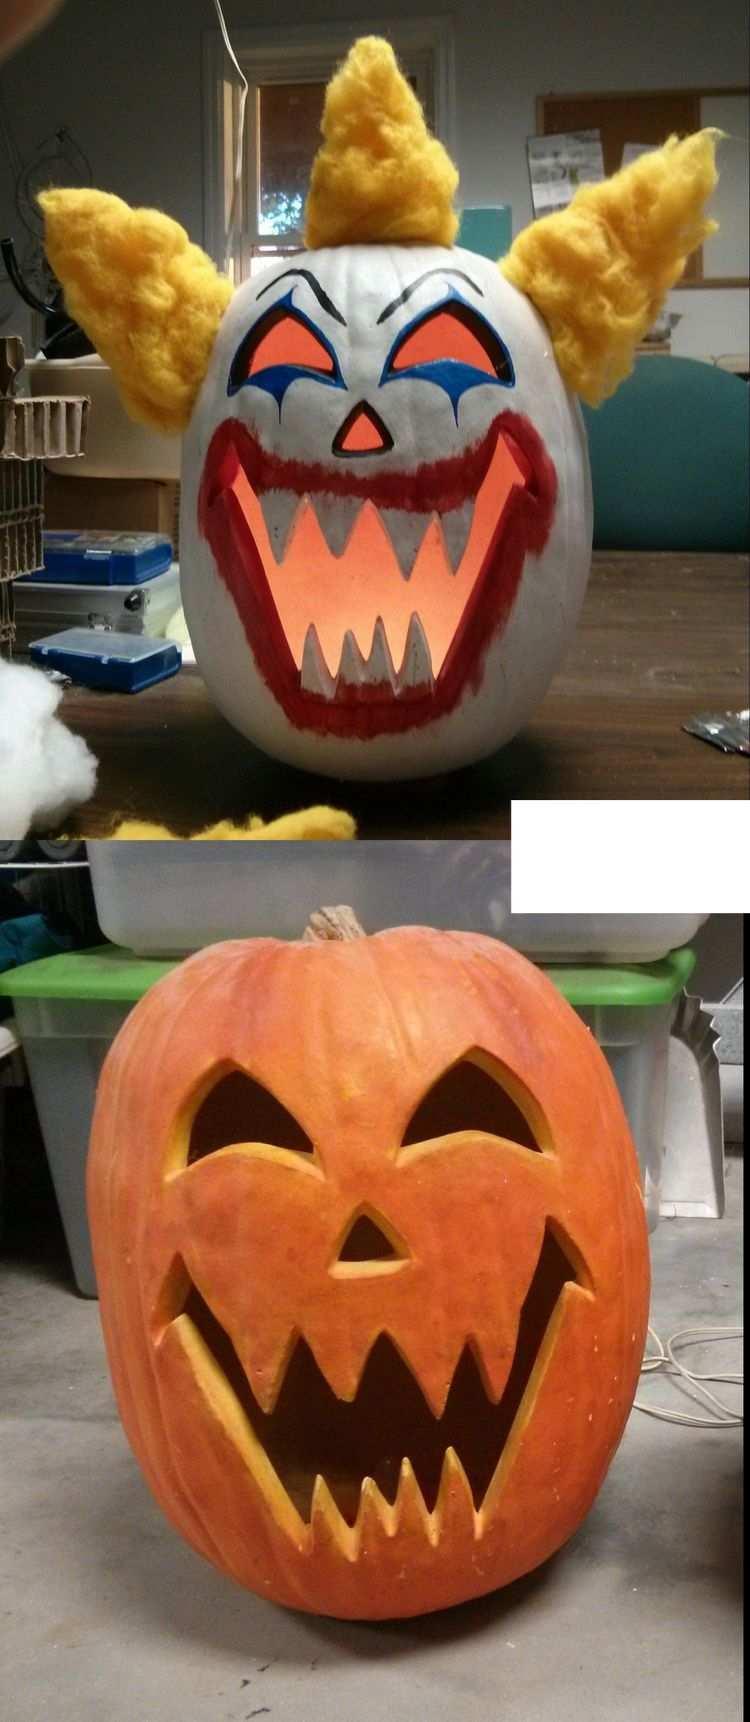 Gruseliges Kurbisgesicht Clown Malen Selber Machen Gruselige Kurbisse Kurbisgesichter Halloween Kurbis Deko